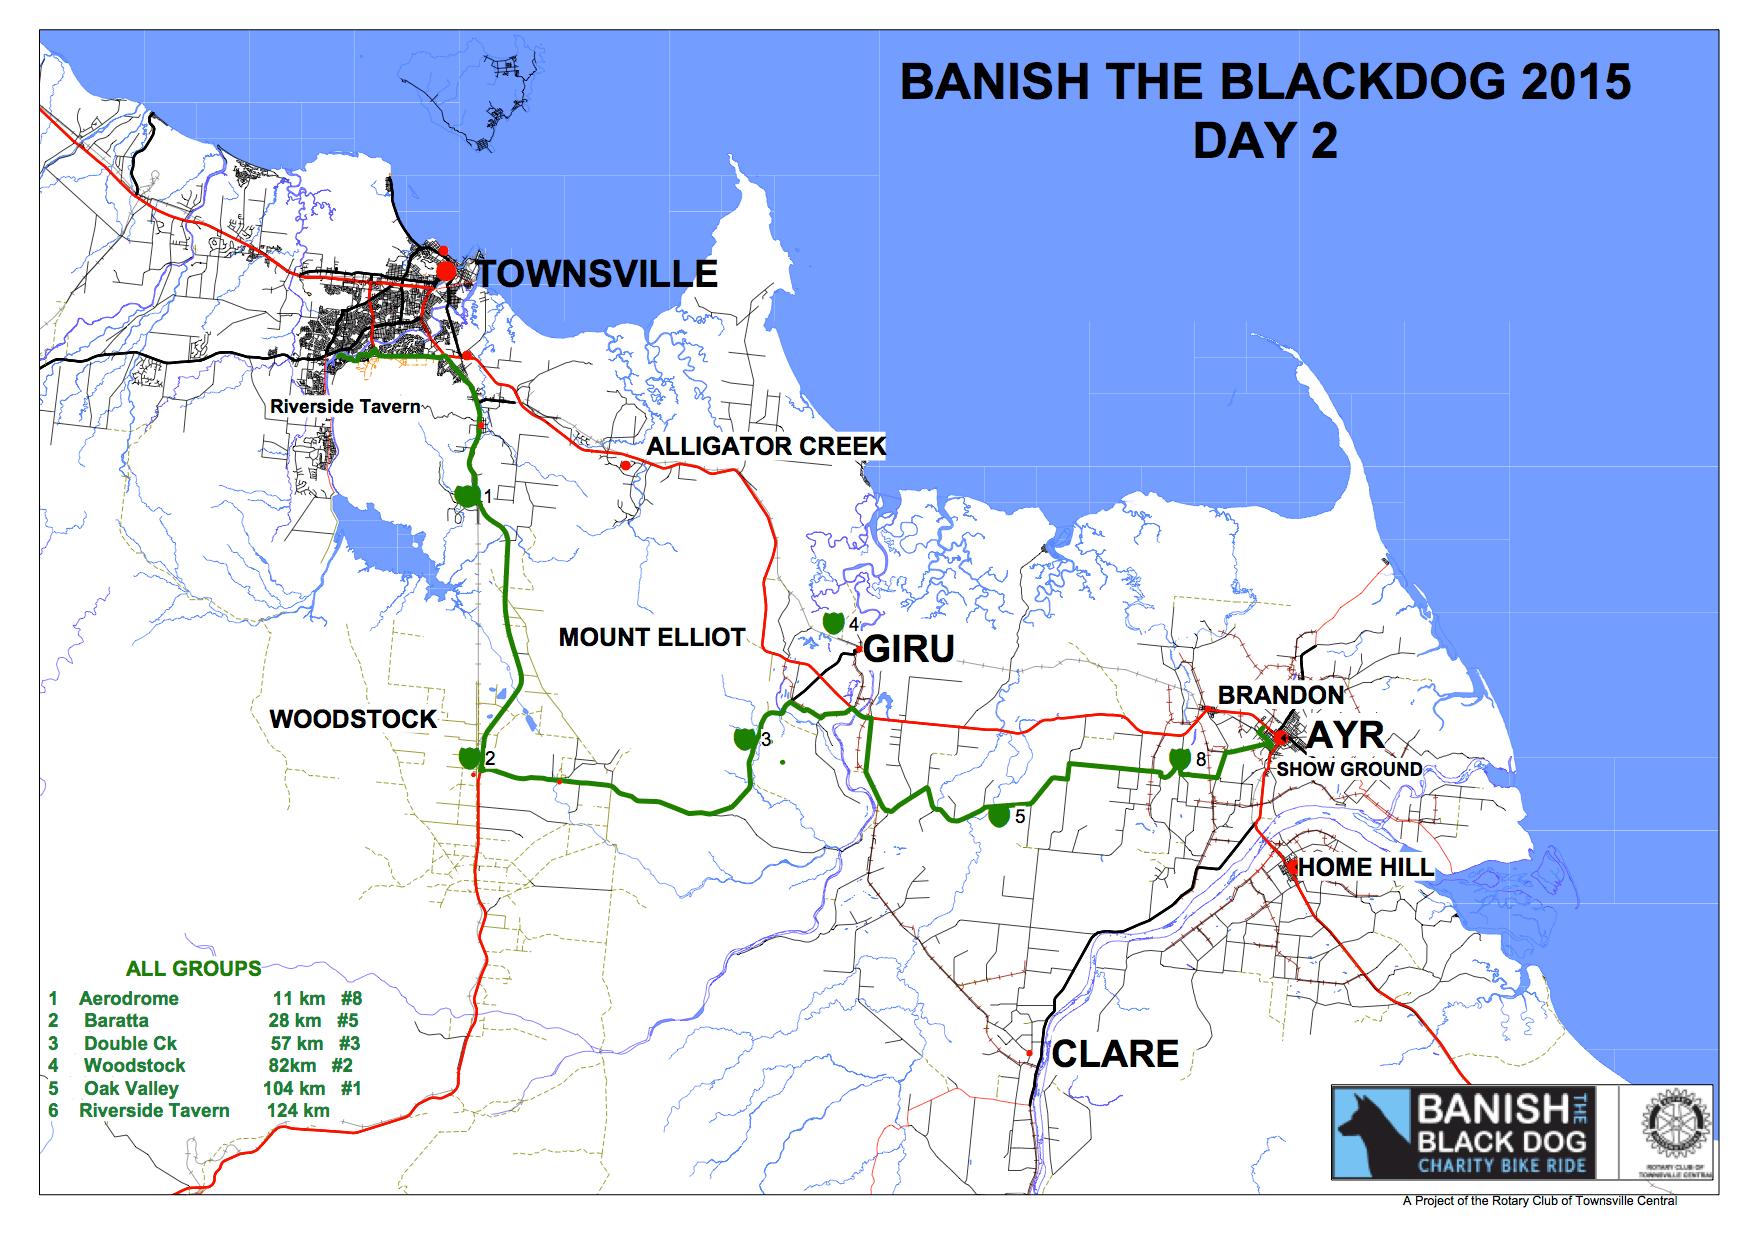 Banish The Black Dog 2015 Map Day 2